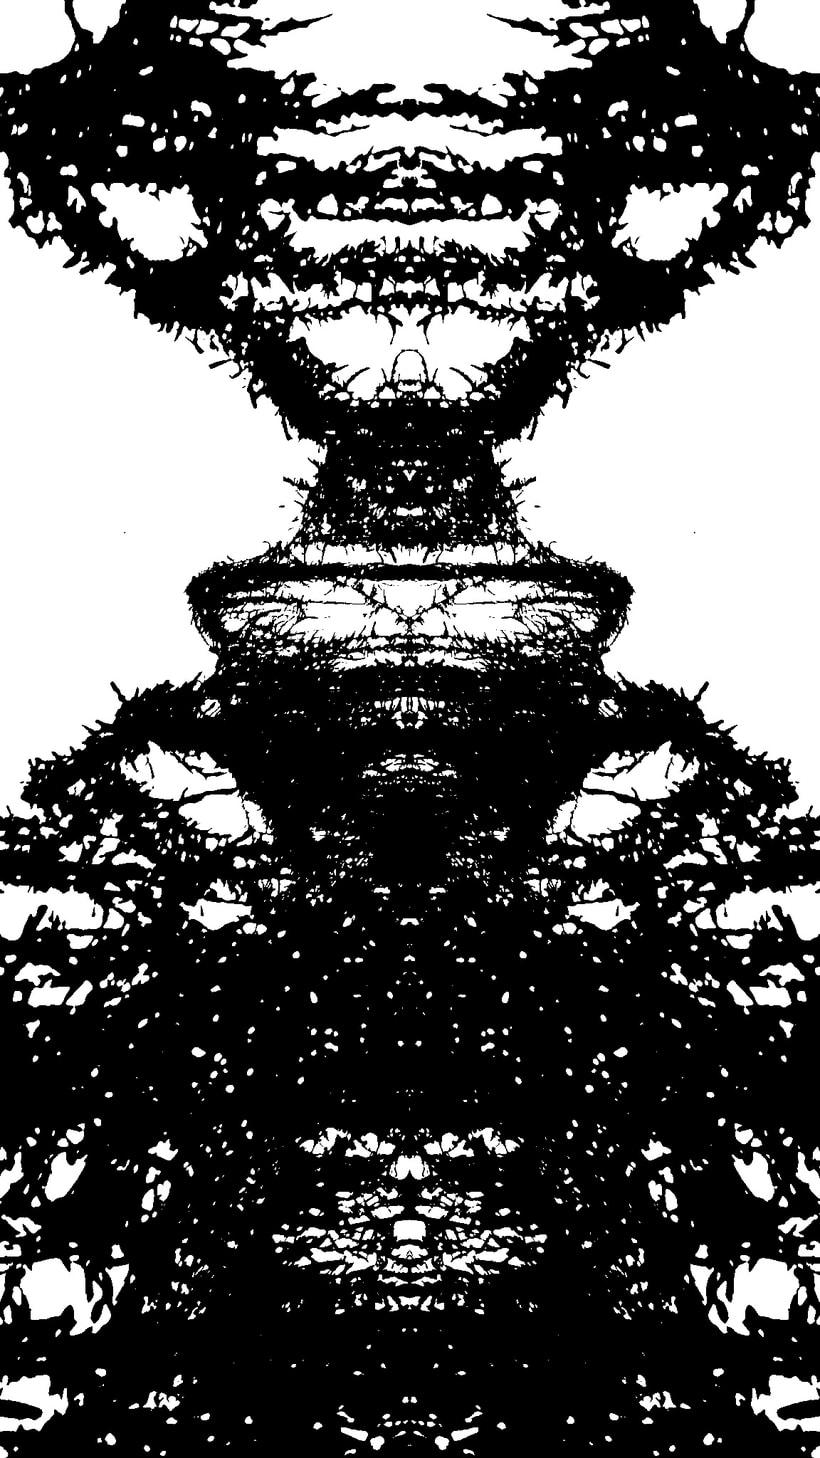 Imágenes ROSCHACH, múltiples lecturas. 13